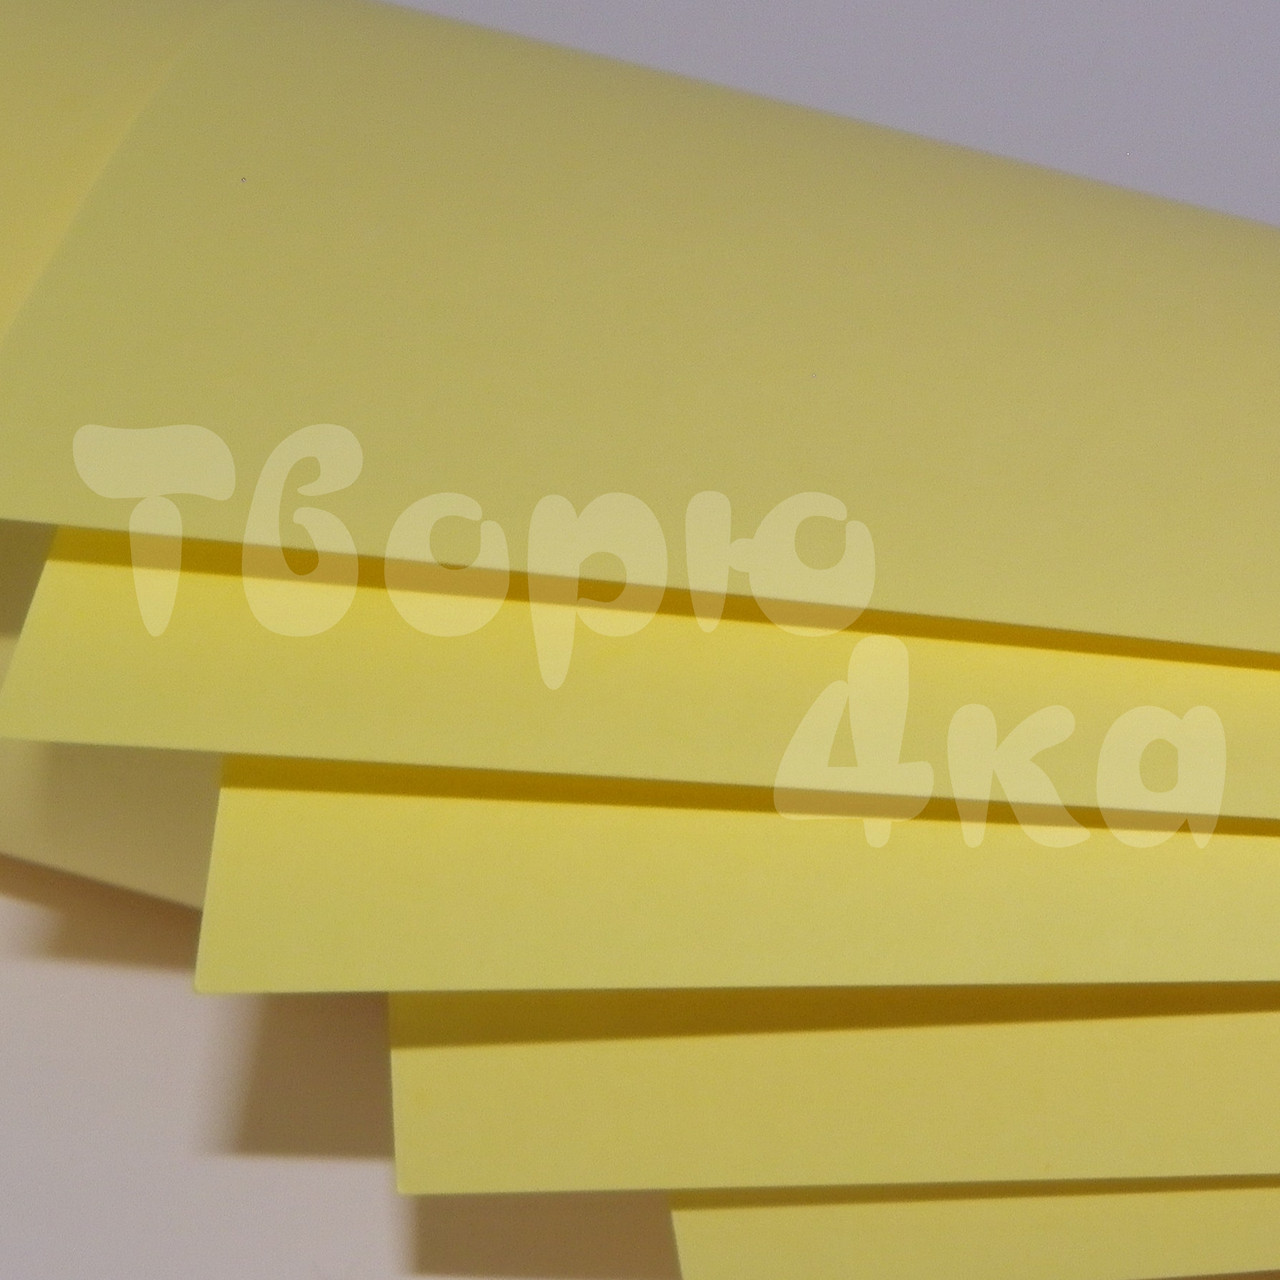 Бумага цветная А4 160 гр/м.кв light yellow (желтый)